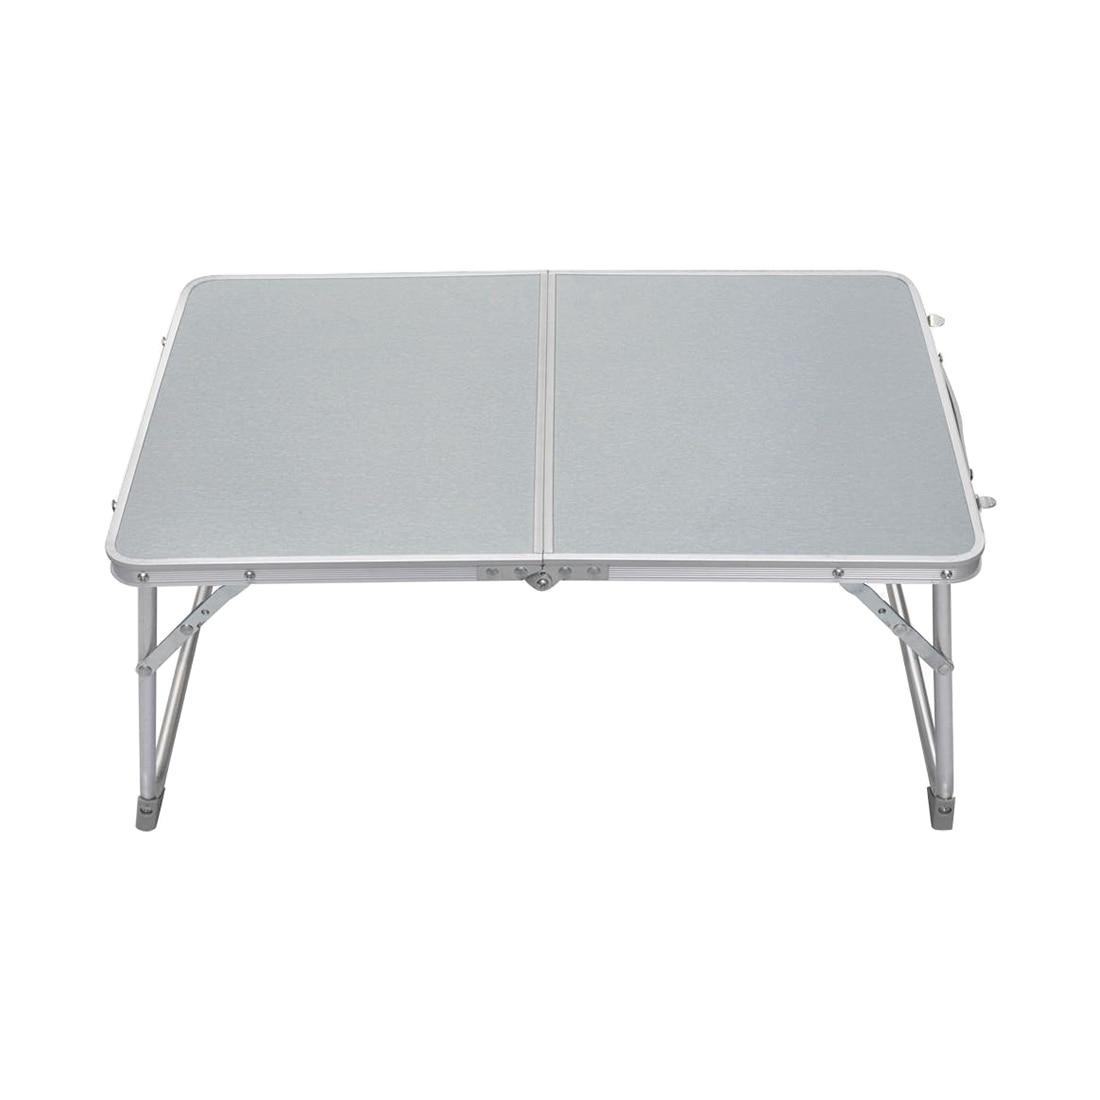 Small 62x41x28cm/24.4x16.1x11 PC Laptop Table Bed Desk Camping Picnic BBQ alice olivia повседневные шорты